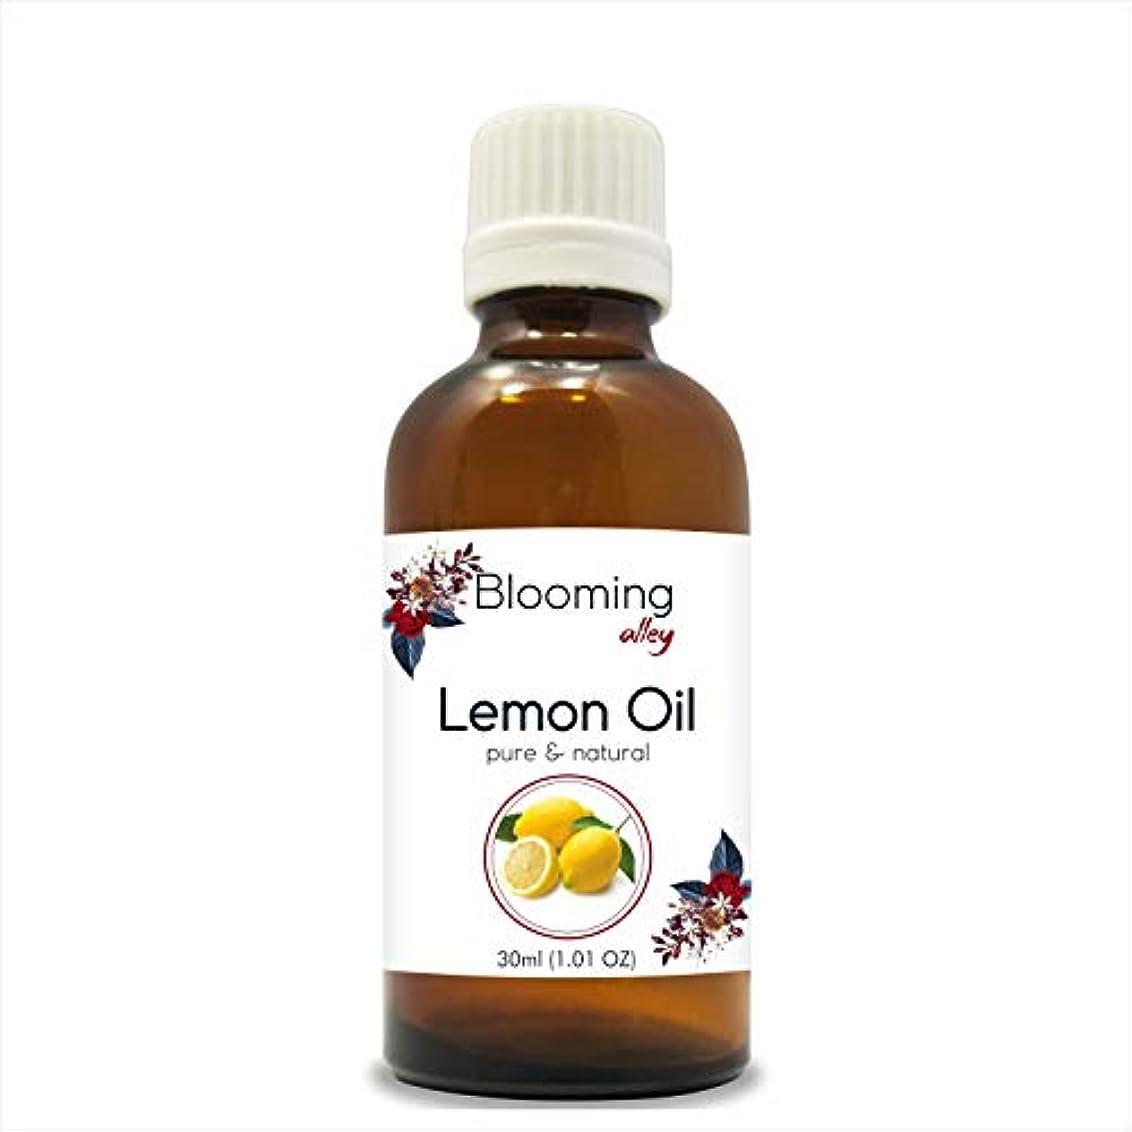 Lemon Oil (Citrus Limonum) Essential Oil 30 ml or 1.0 Fl Oz by Blooming Alley